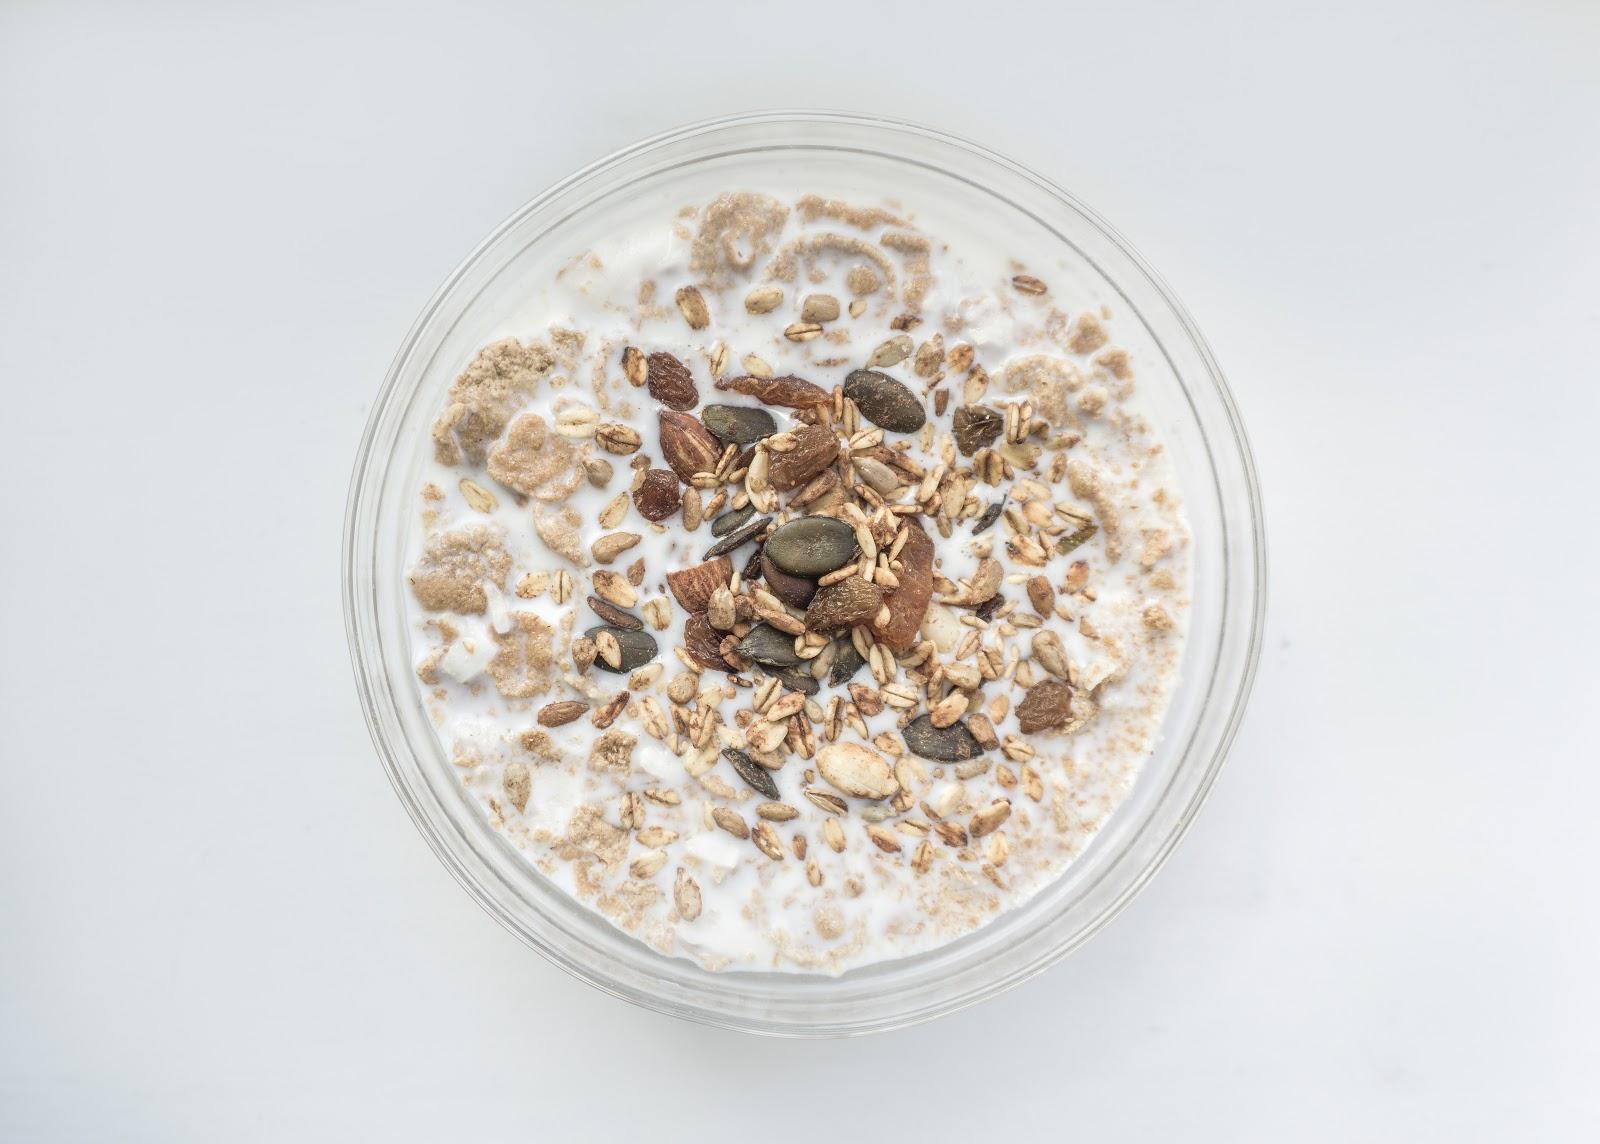 flocon d'avoine top ingrédient healthy marsemd18